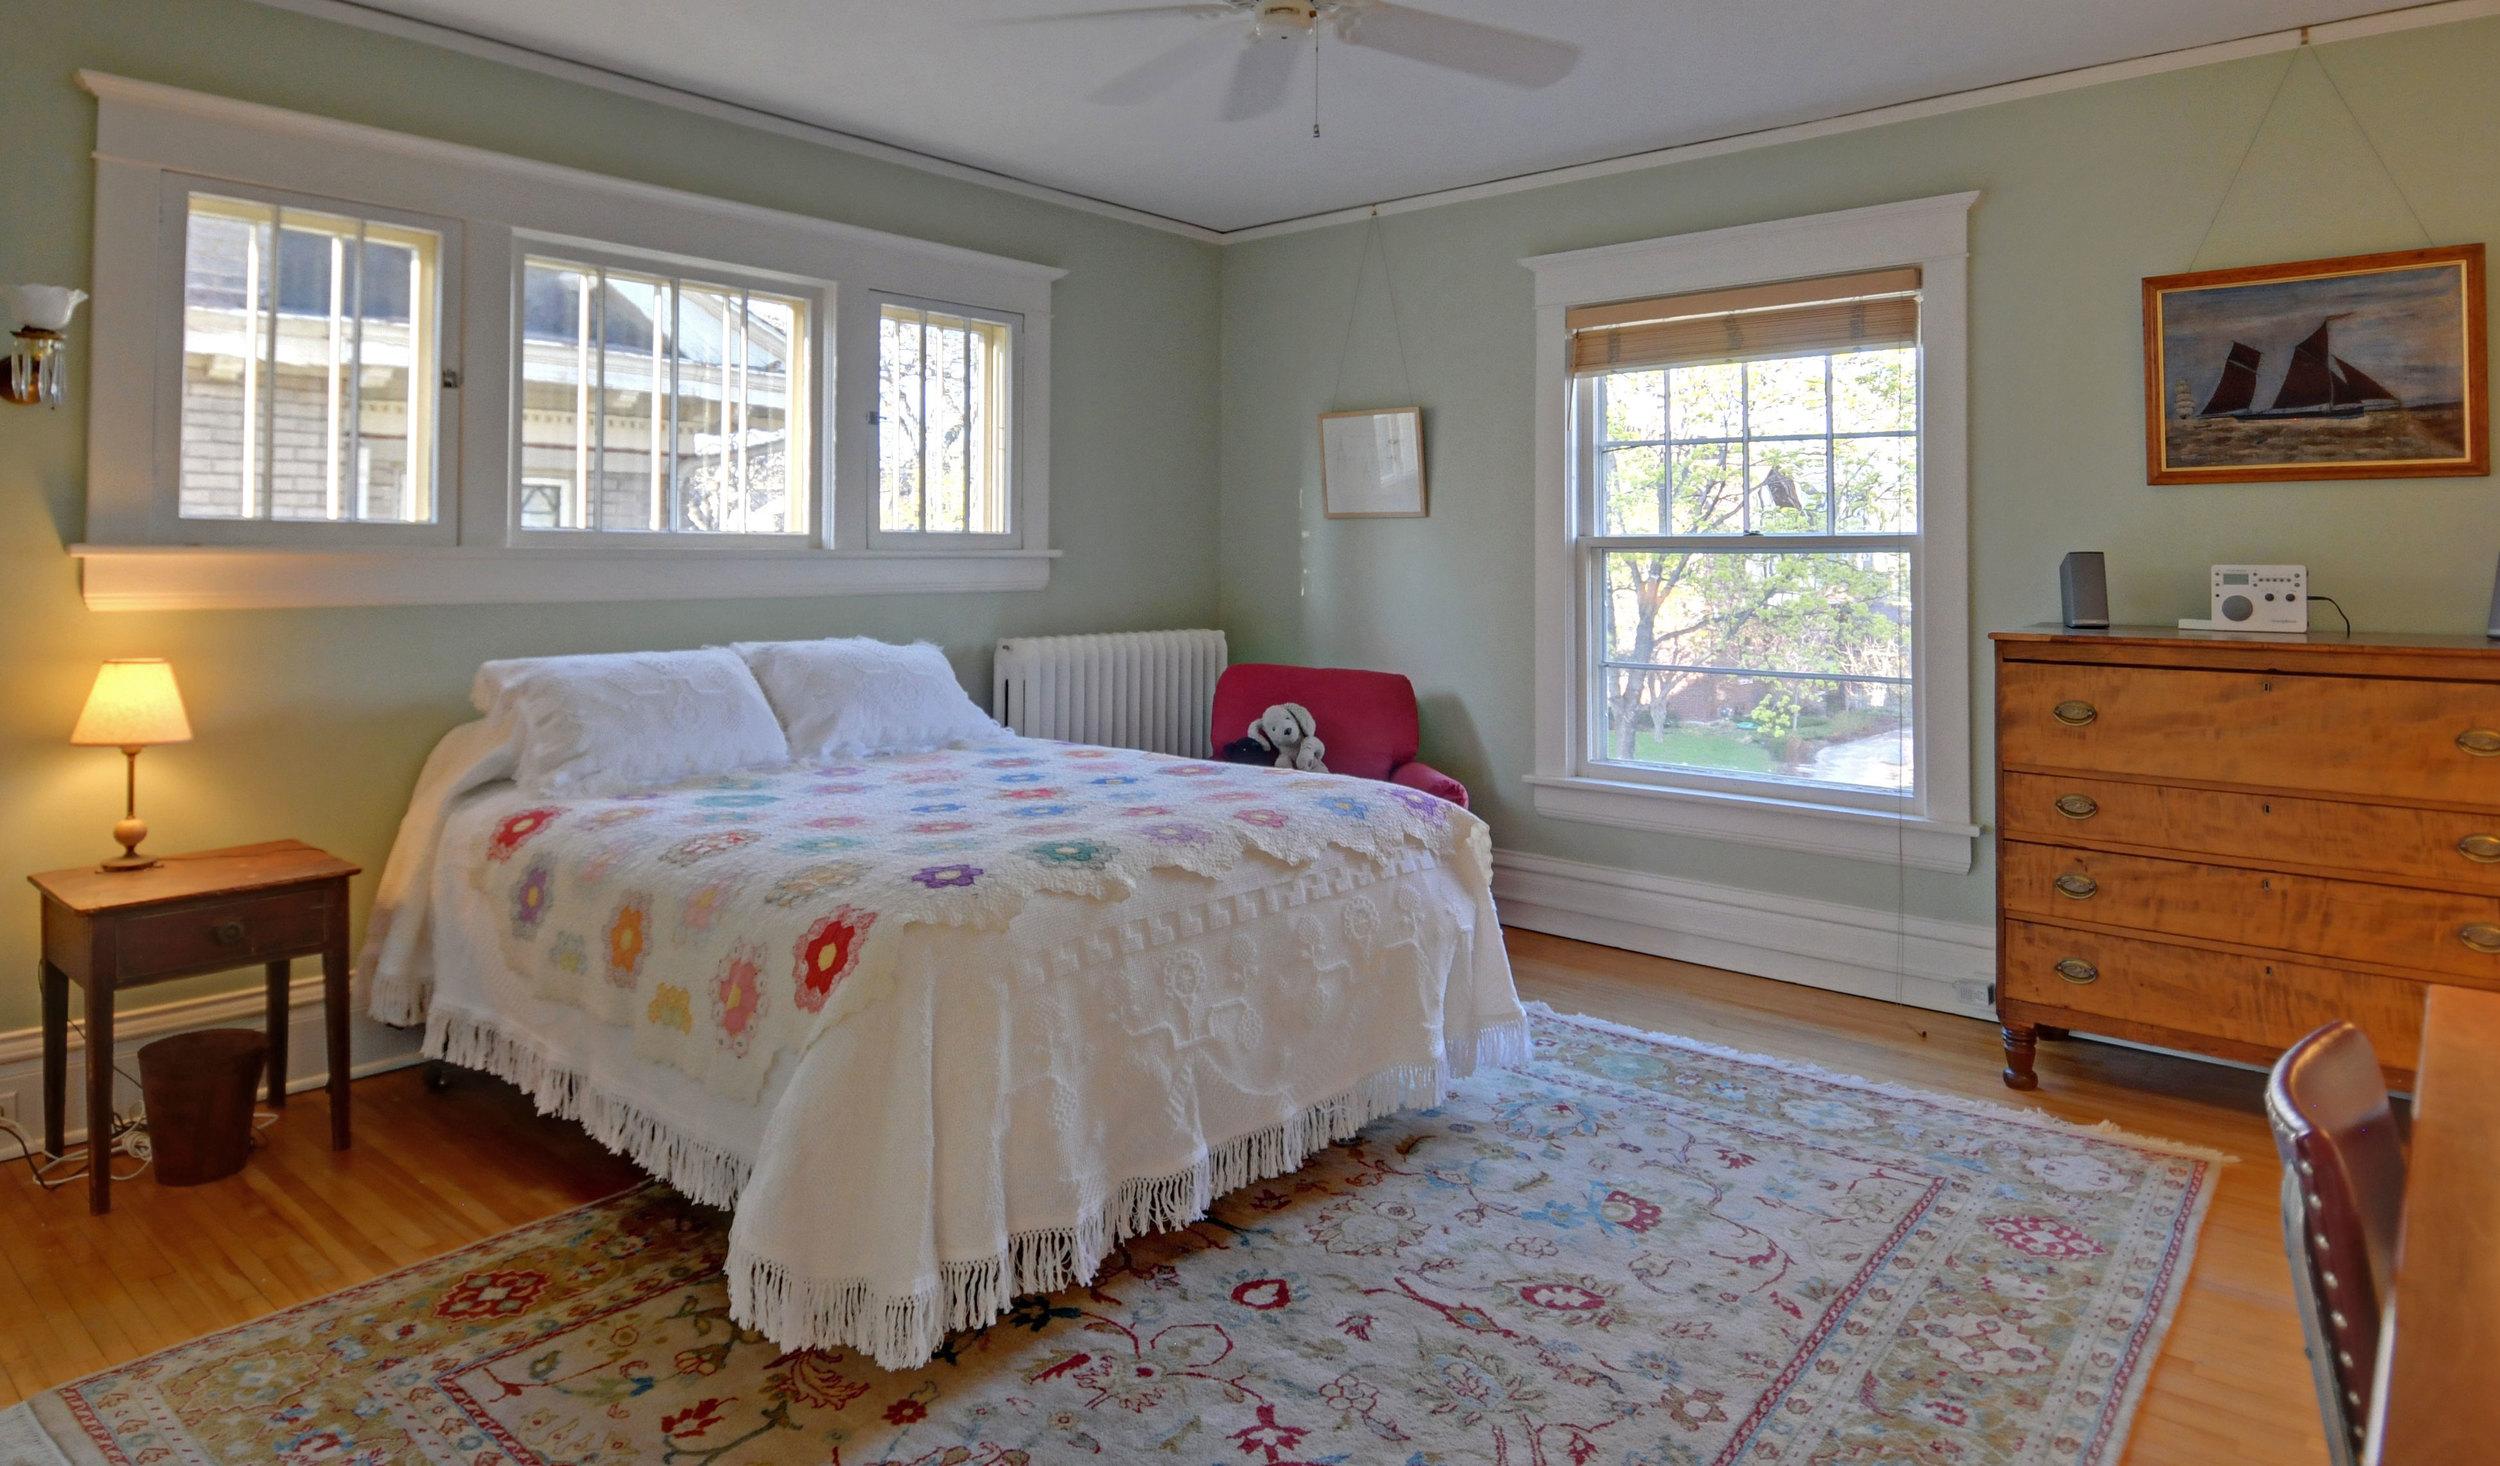 2424-bedroom-1.jpg